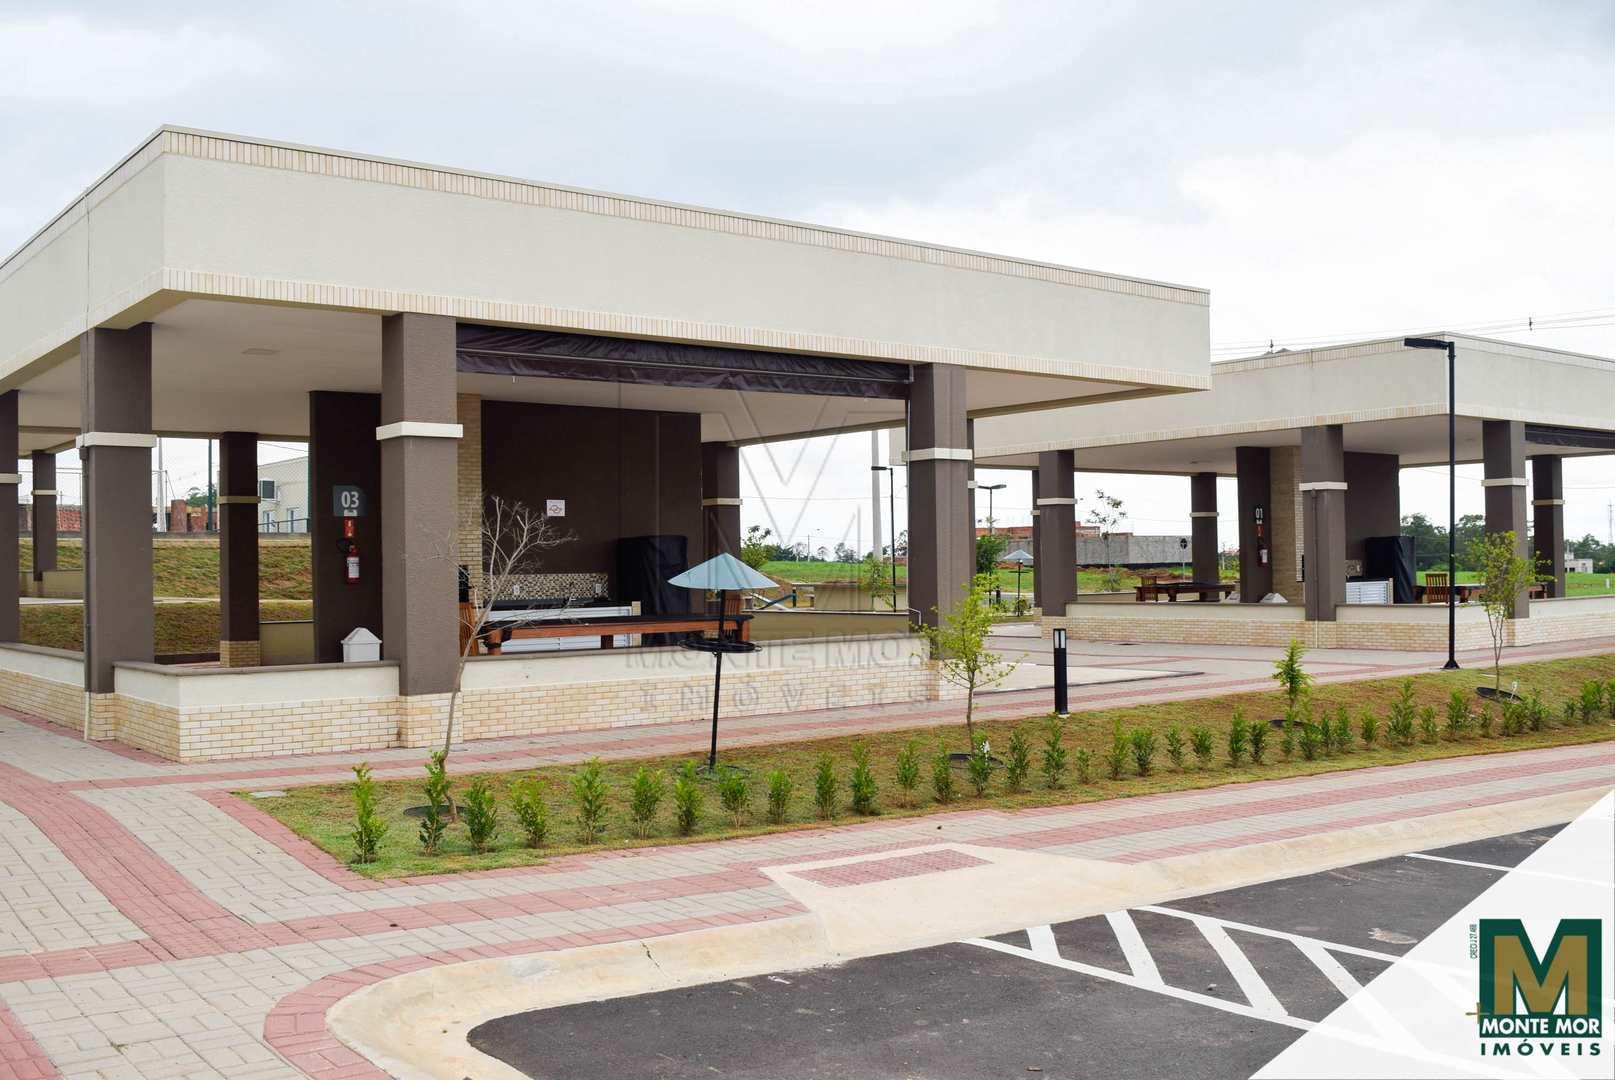 Terreno de Condomínio - Residencial Monterrey - Monte Mor - SP